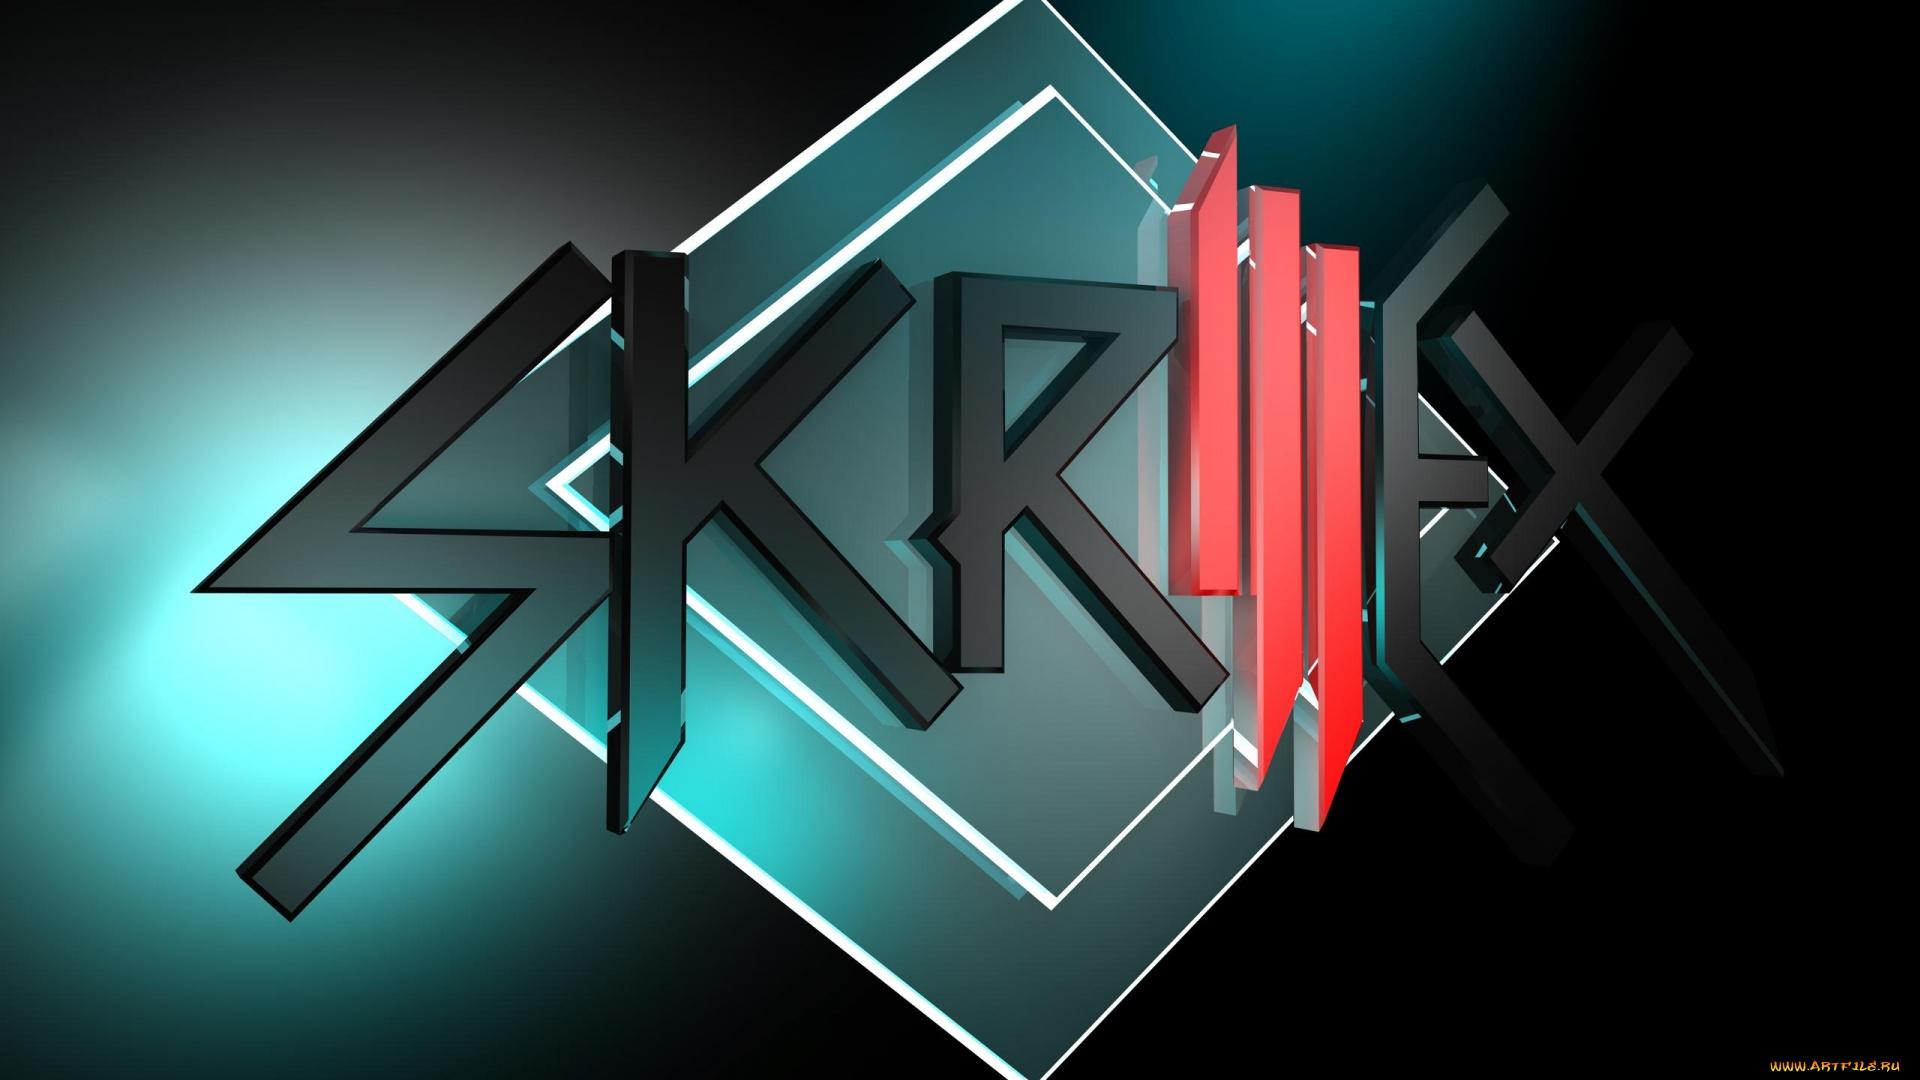 Skrillex Wallpaper Download Full